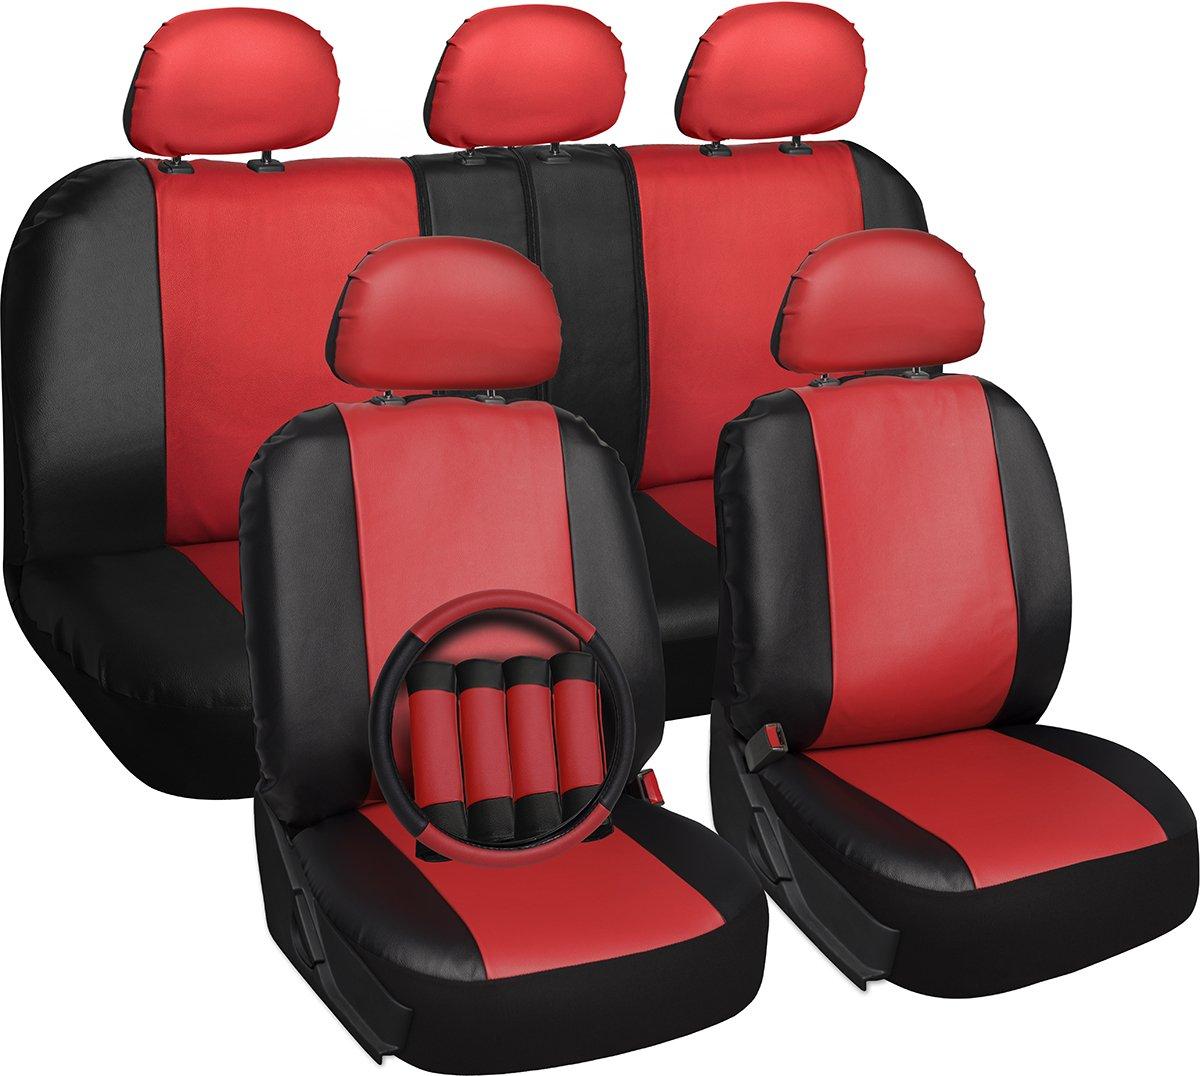 Oxgord 17pc Set PU Leather Red Amp Black Auto Seat Covers